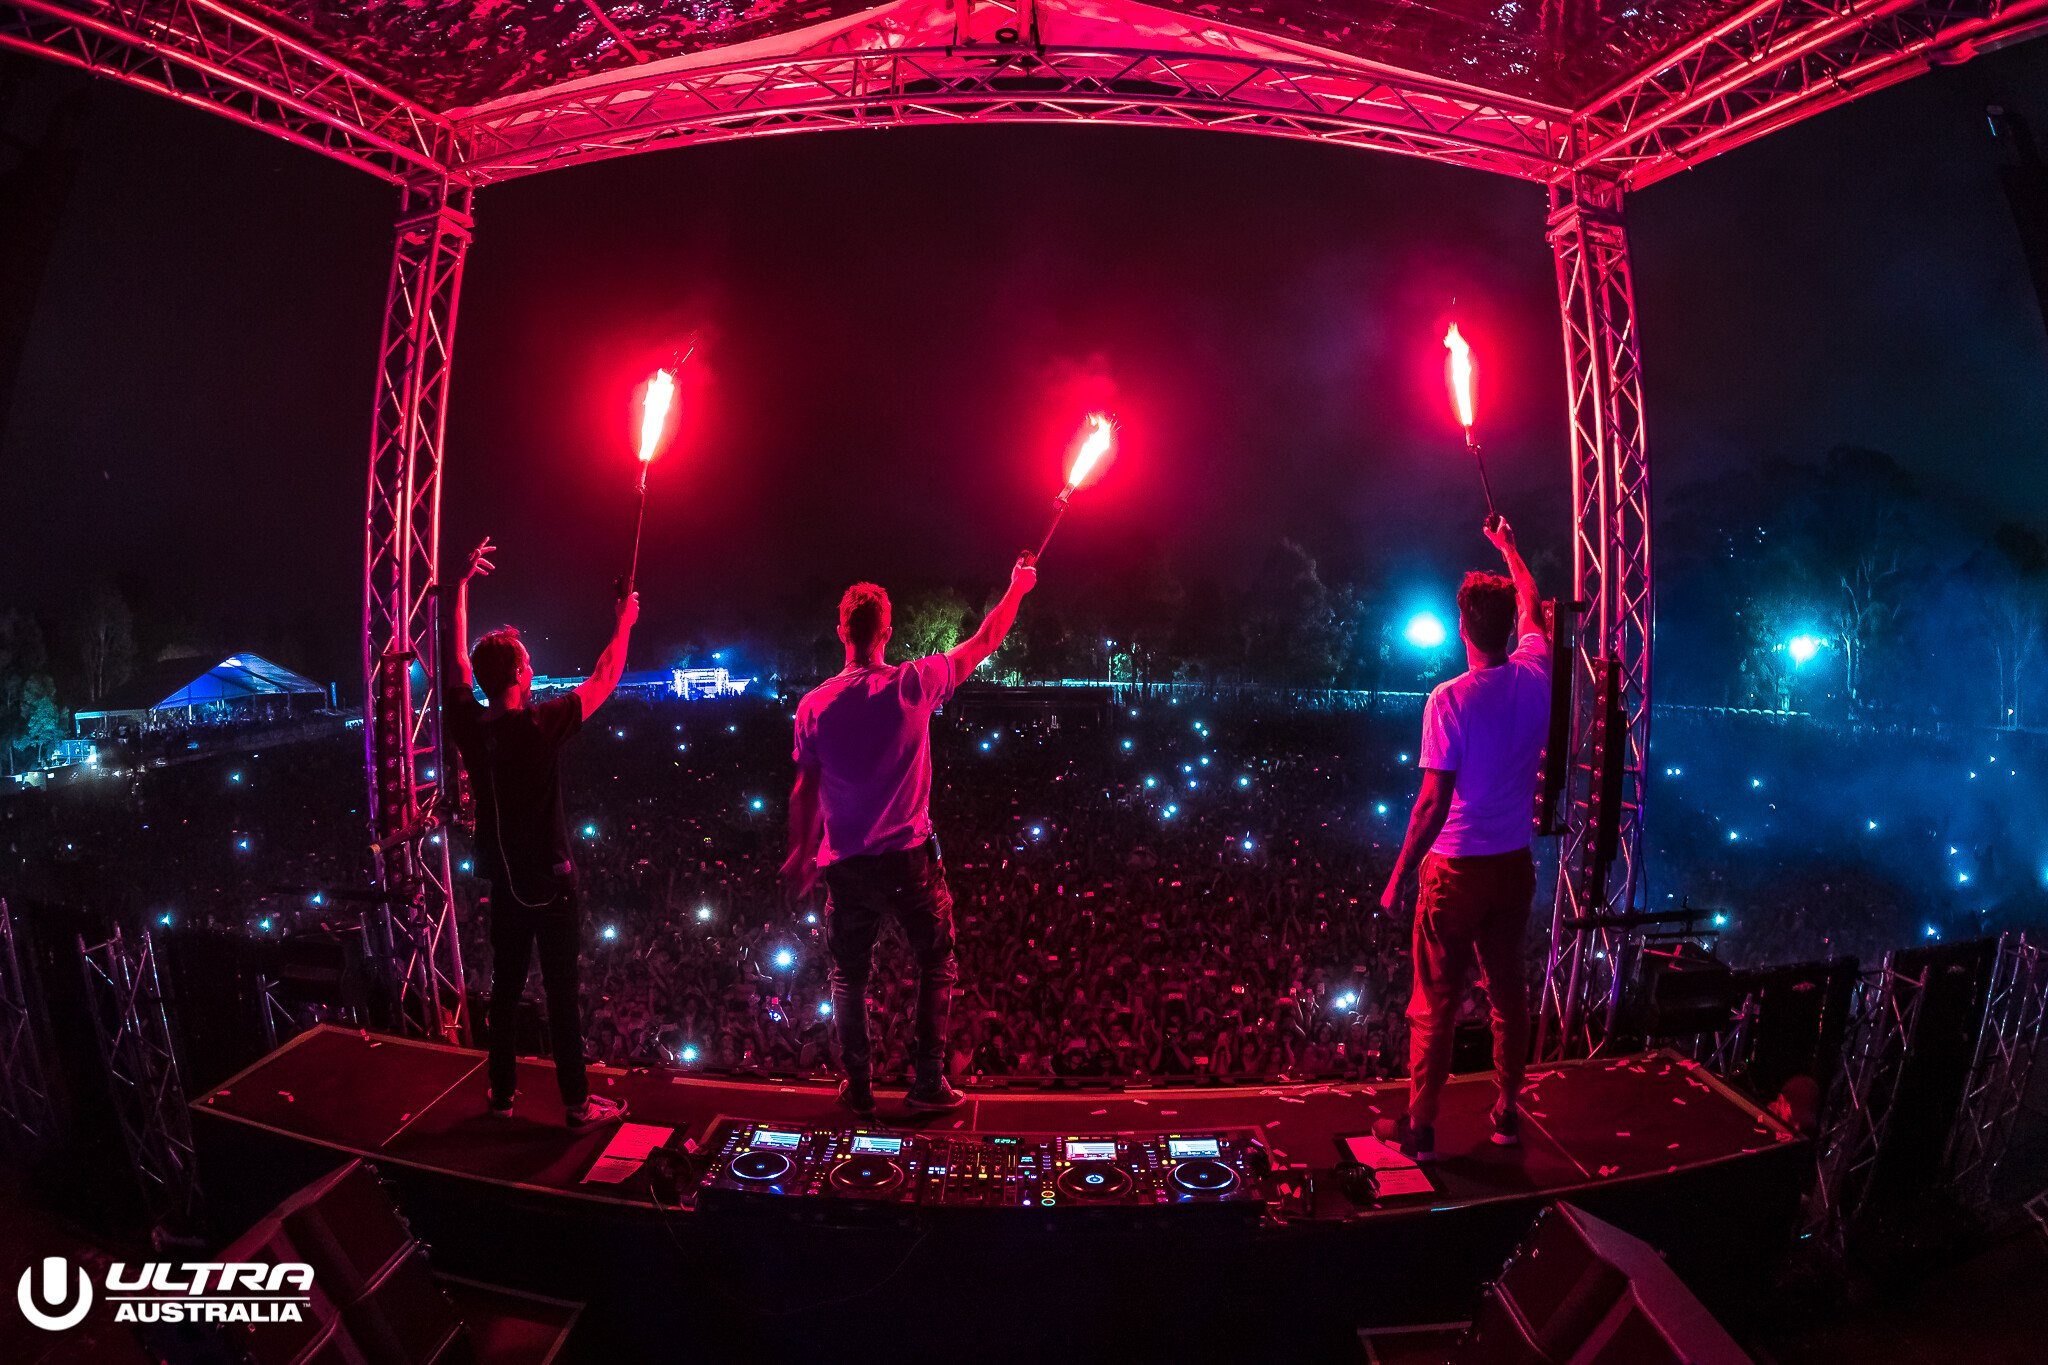 Ultra Music Festival Australia 2020